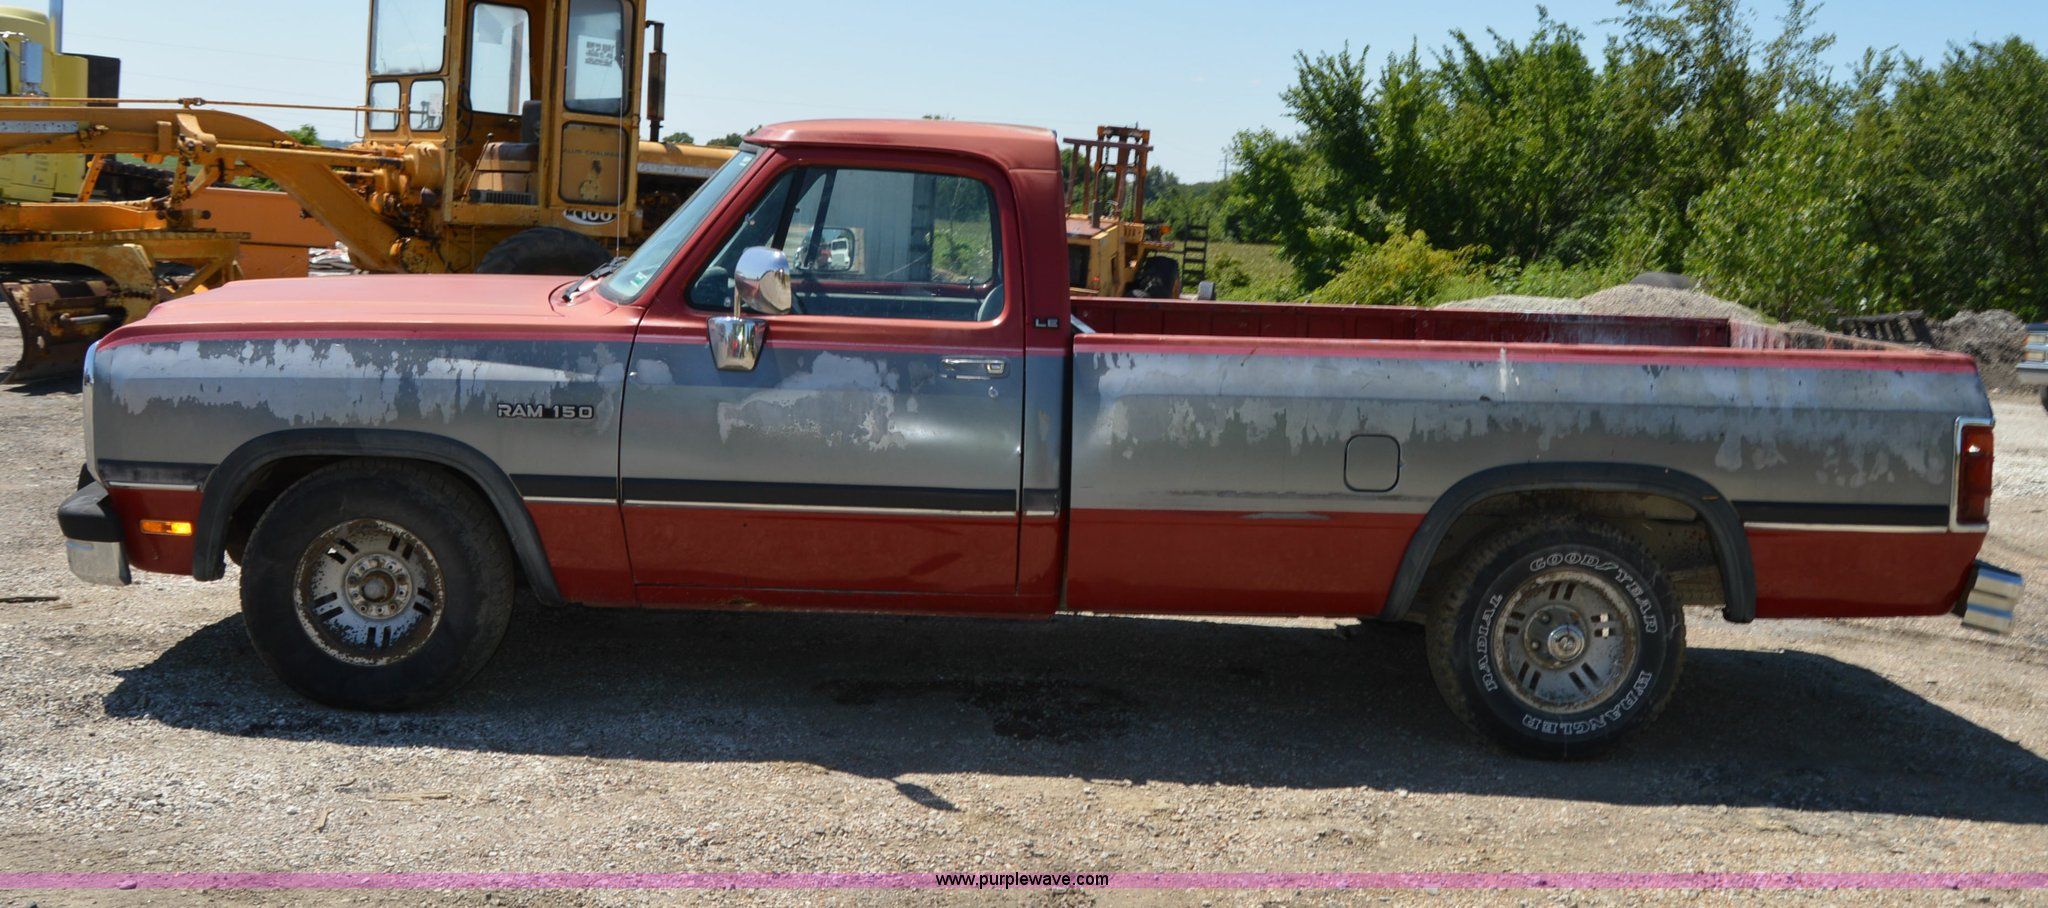 1992 dodge d150 le pickup truck full size in new window